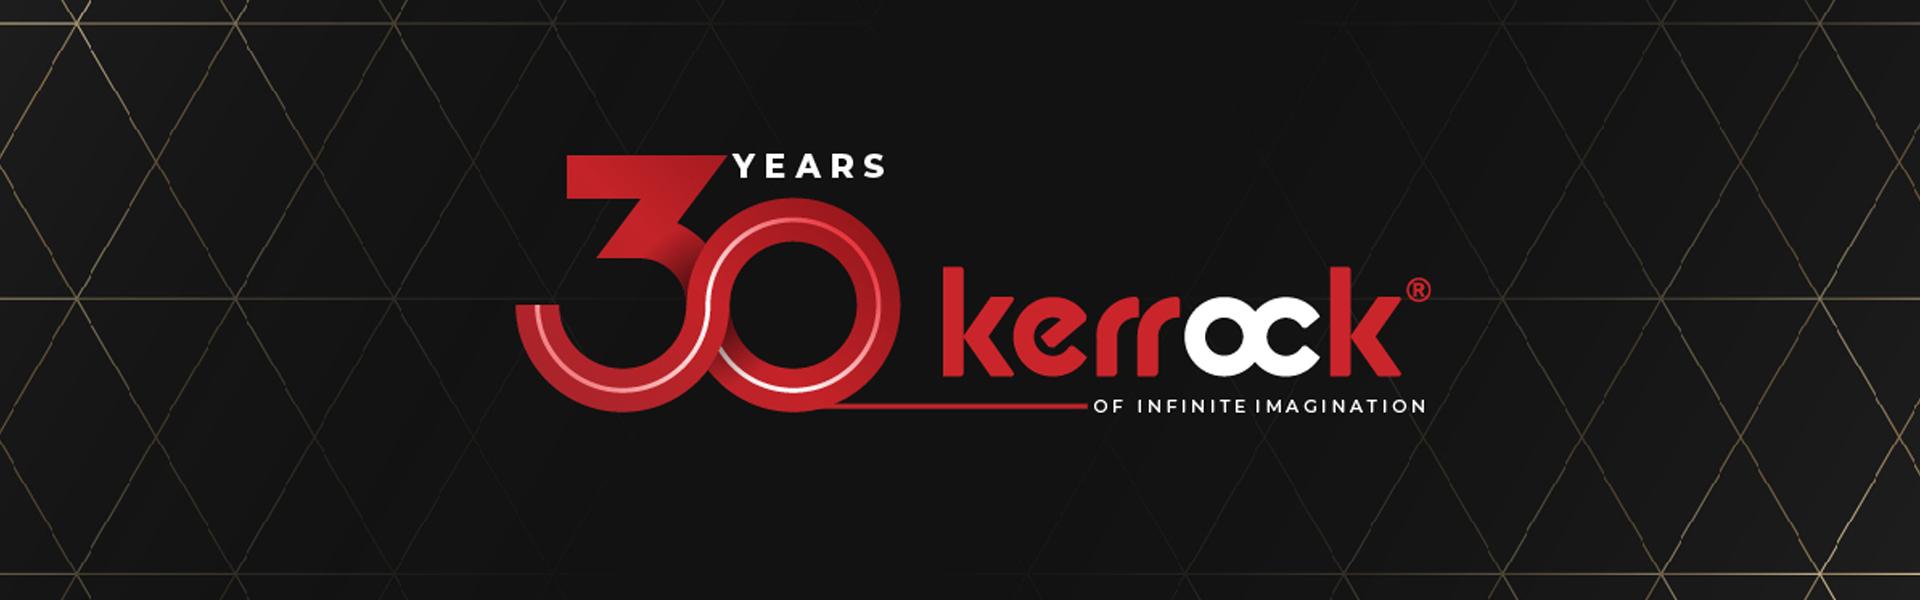 30 YEARS OF KERROCK